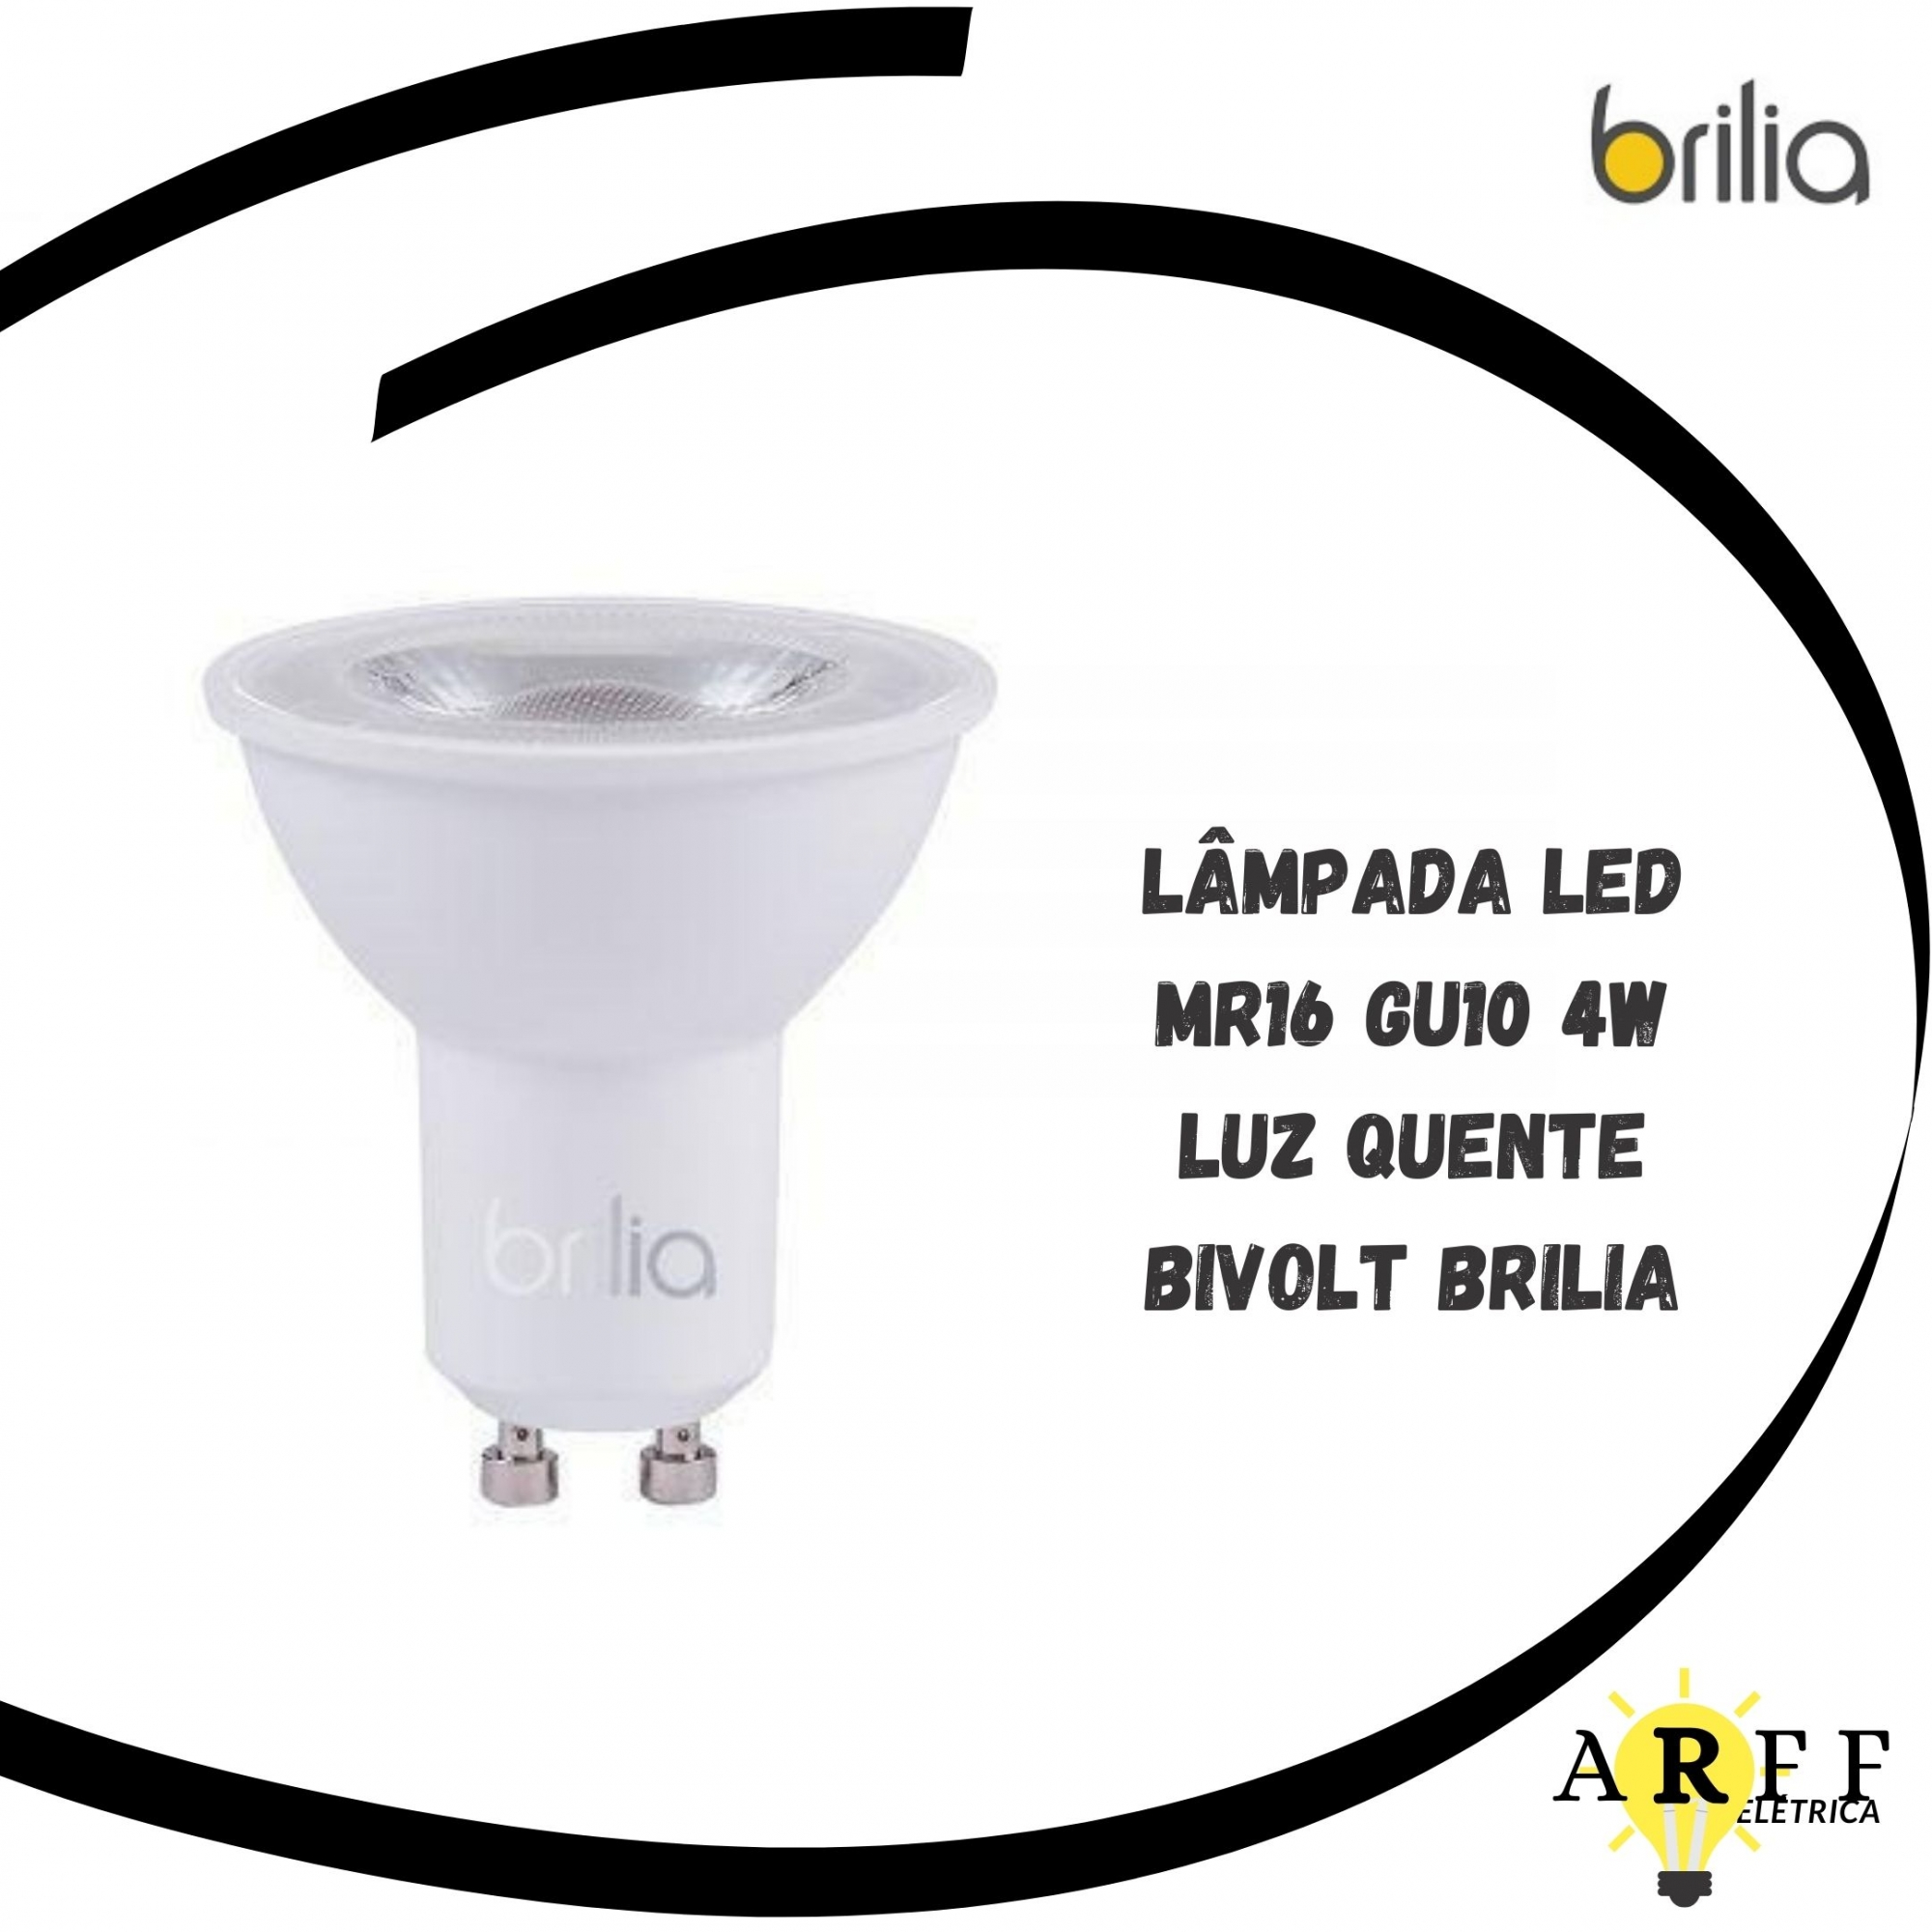 Lampada Led Dicroica MR16 GU10 4W LUZ QUENTE Bivolt BRILIA